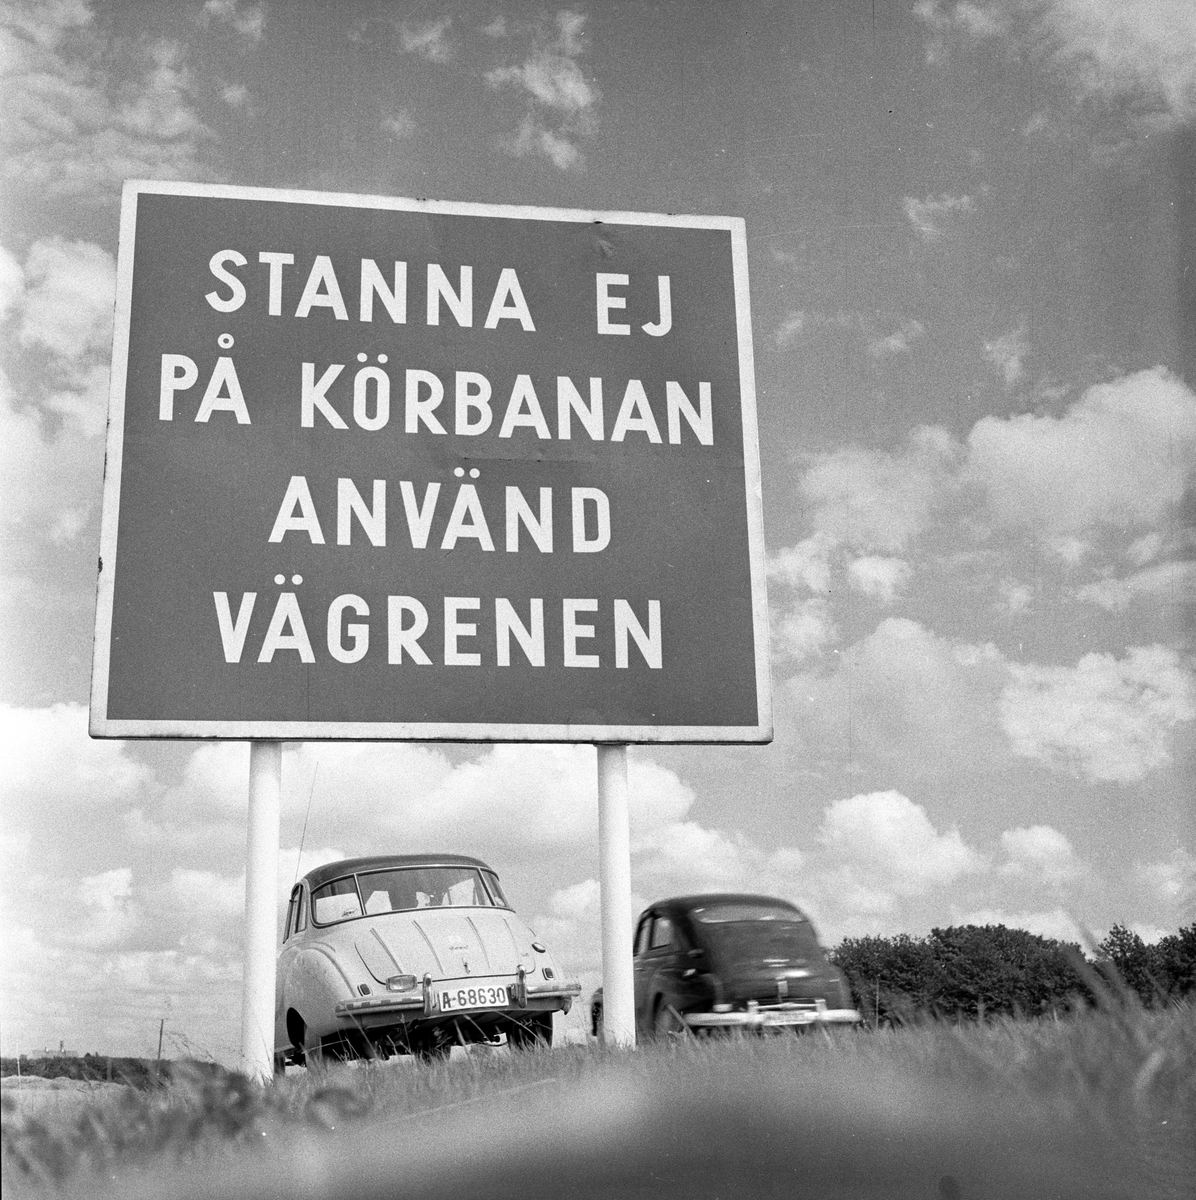 Serie. Motorvei (autostrada) mellom Lund og Malmø.